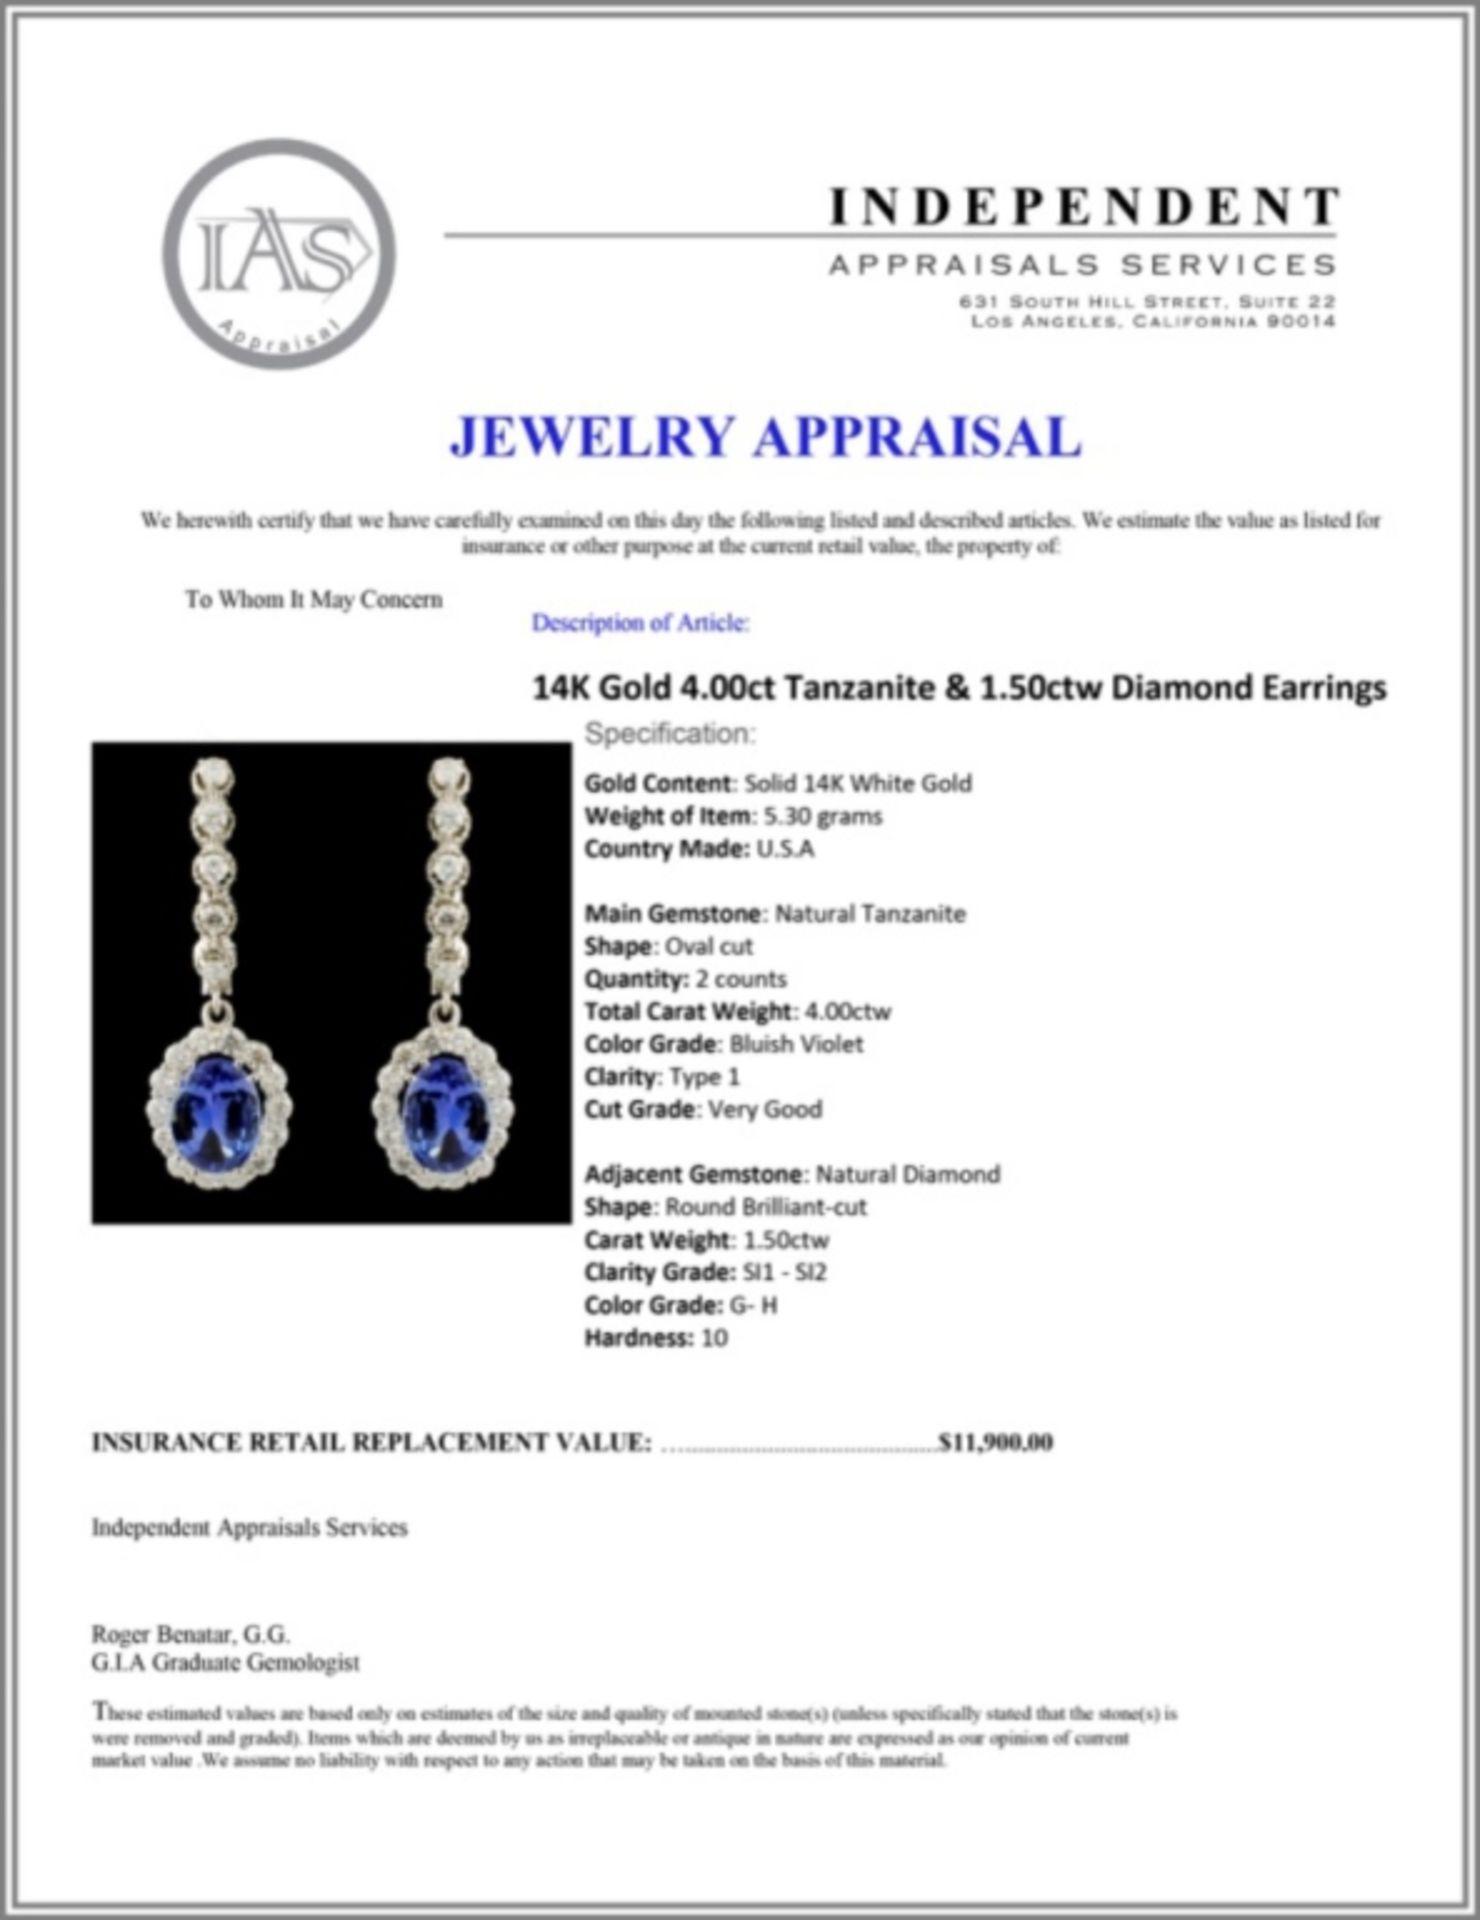 14K Gold 4.00ct Tanzanite & 1.50ctw Diamond Earrin - Image 3 of 3